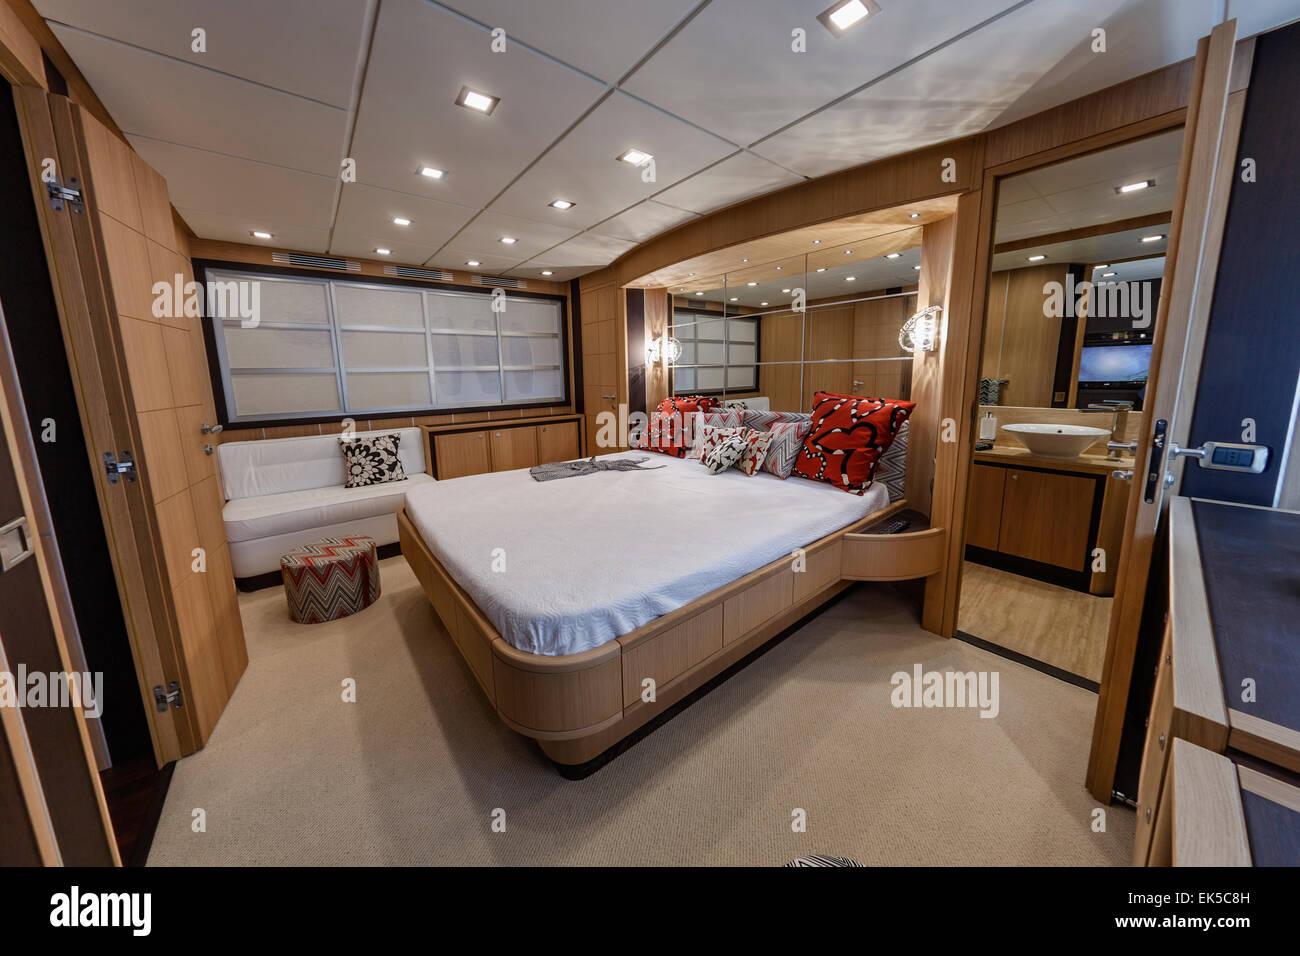 Italy Naples Abacus 70 Luxury Yacht Master Bedroom Stock Photo Royalty Free Image 80639345